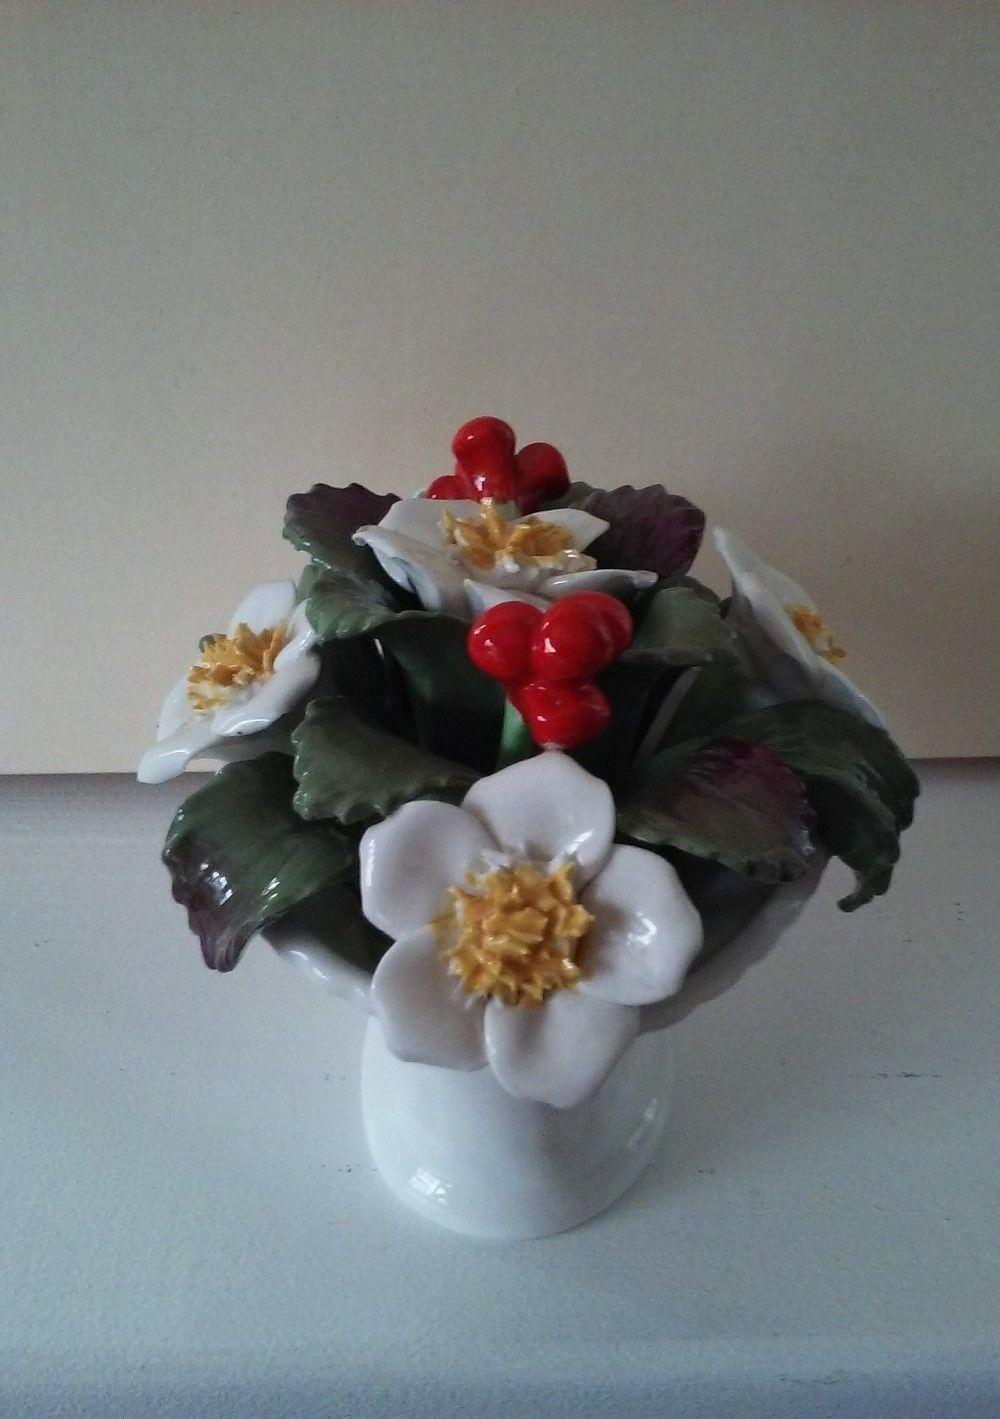 Vintage Aynsley Bone China December Christmas Rose Basket hand painted bouquet image 6